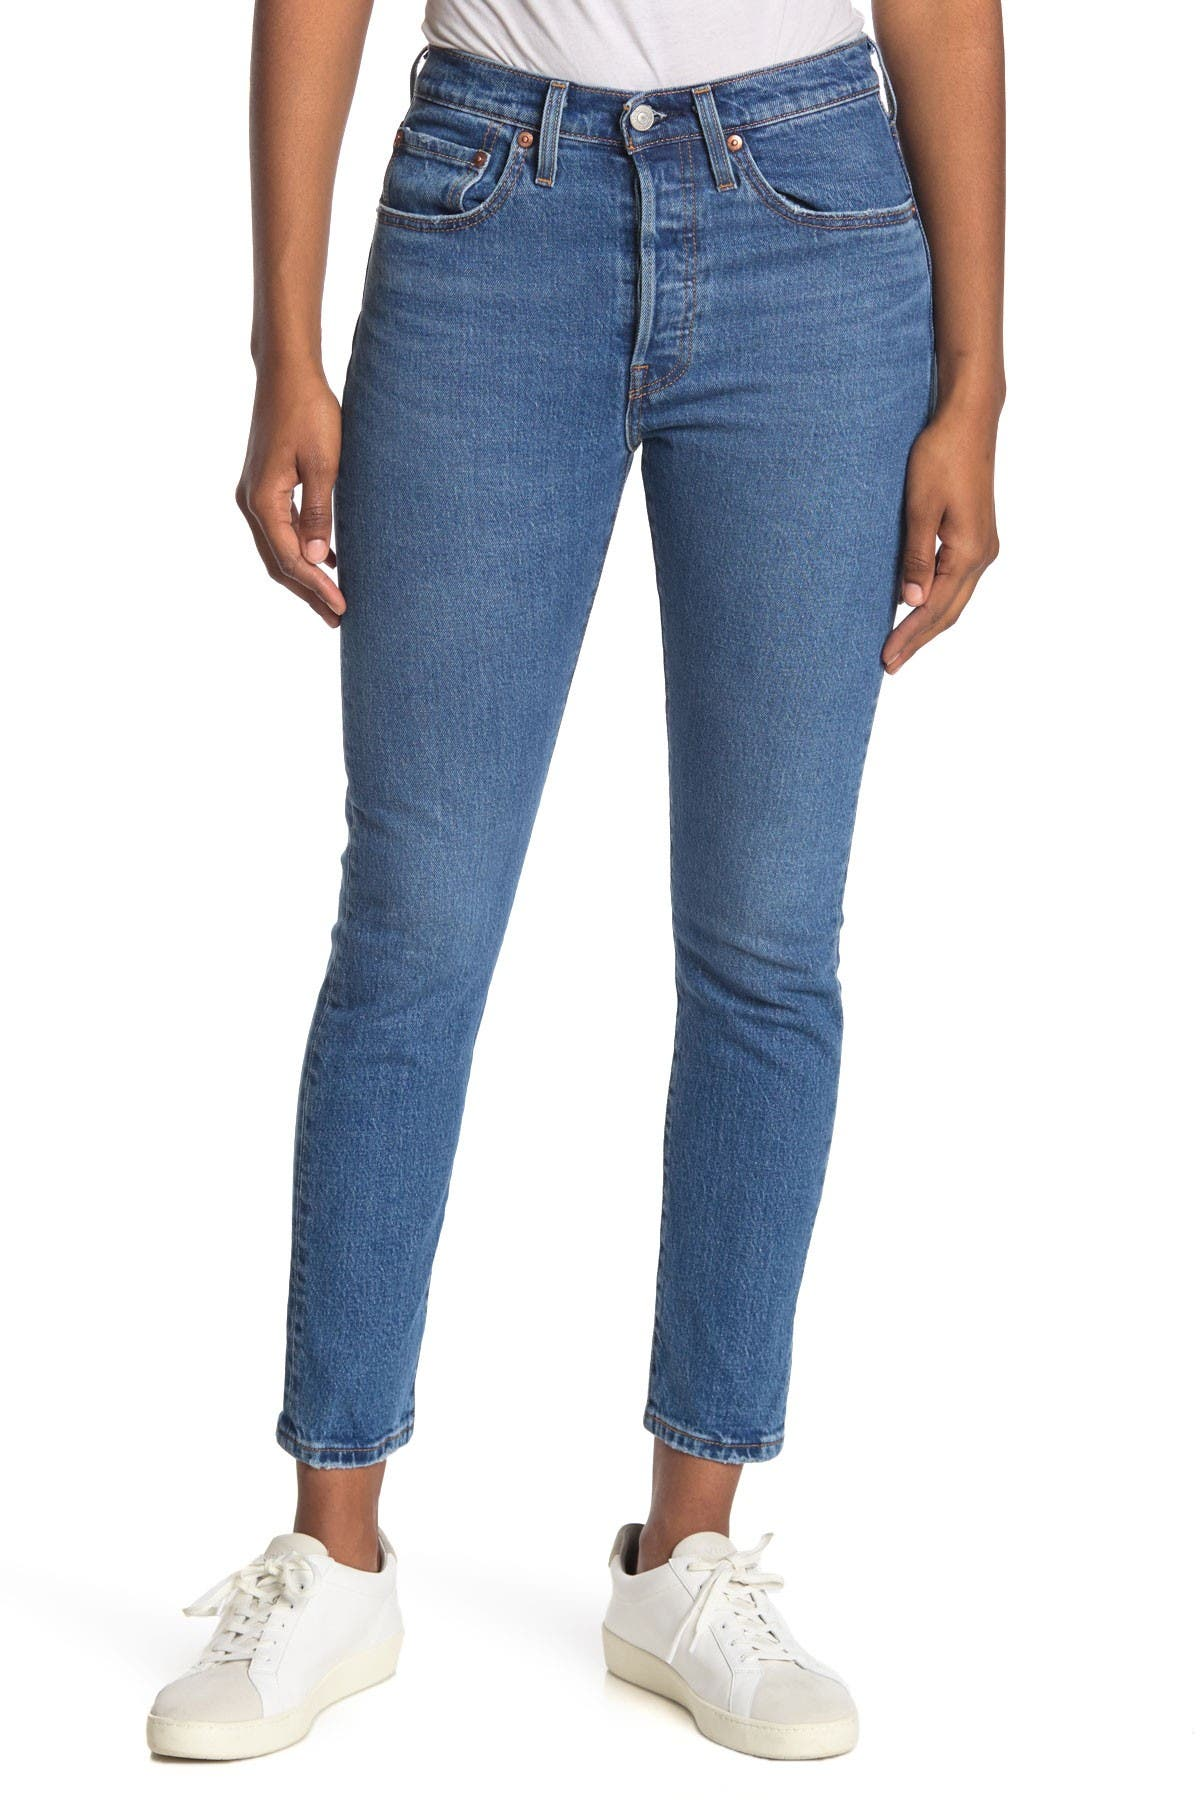 "Image of Levi's 501 Skinny Jeans - 28"" Inseam"